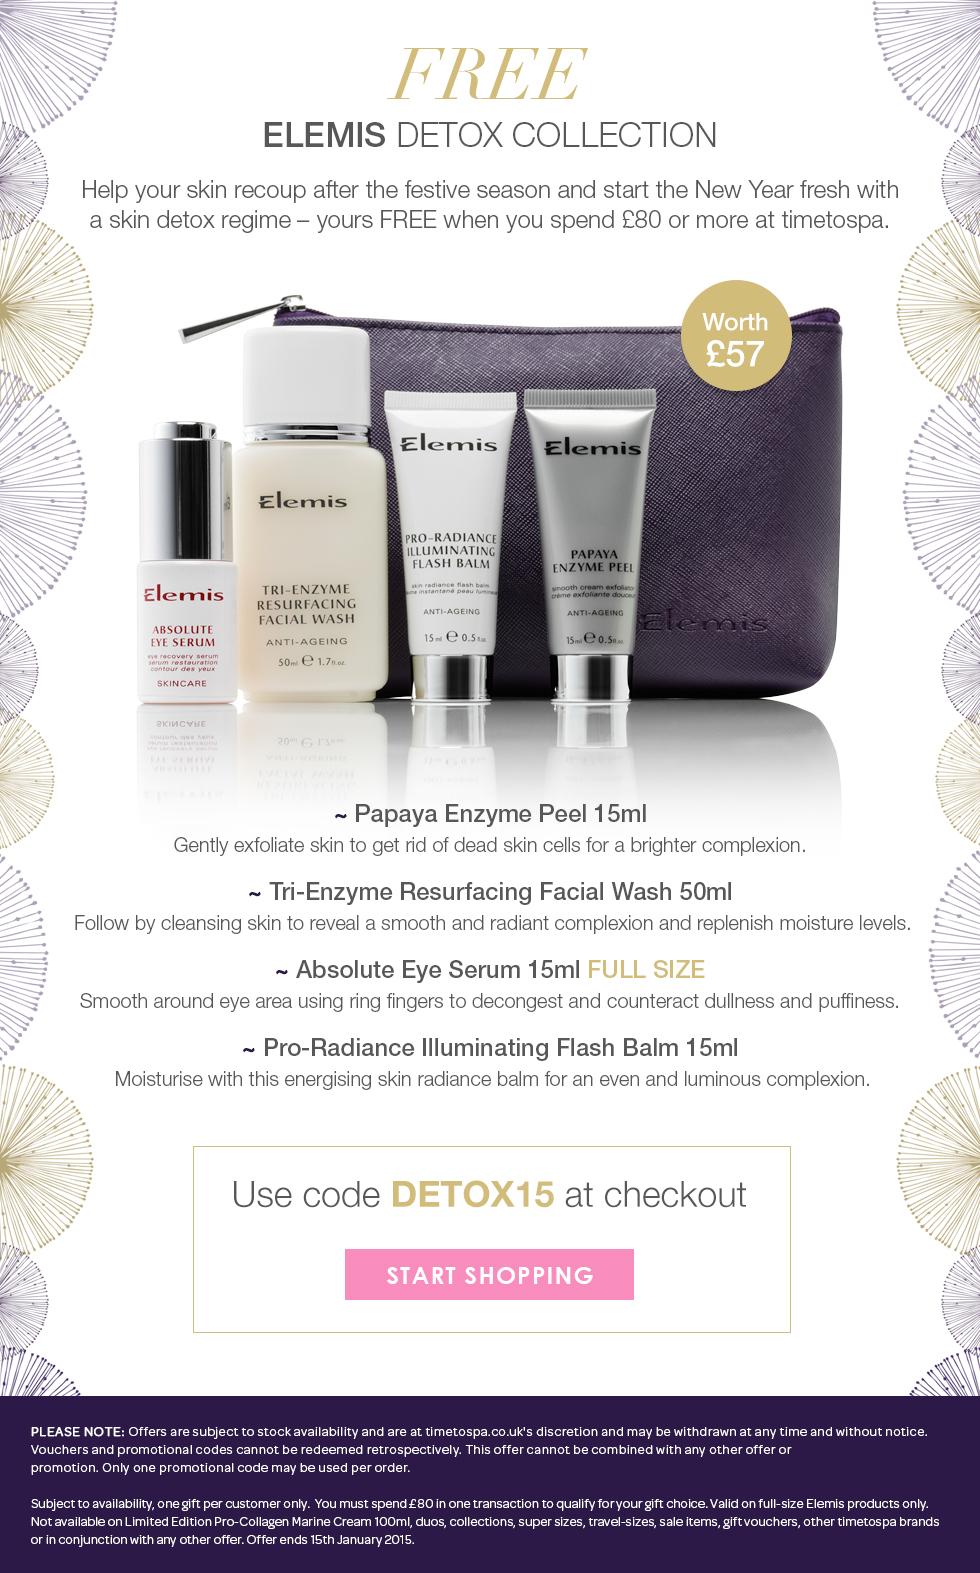 Free ELEMIS Skin Detox Collection - Worth £57